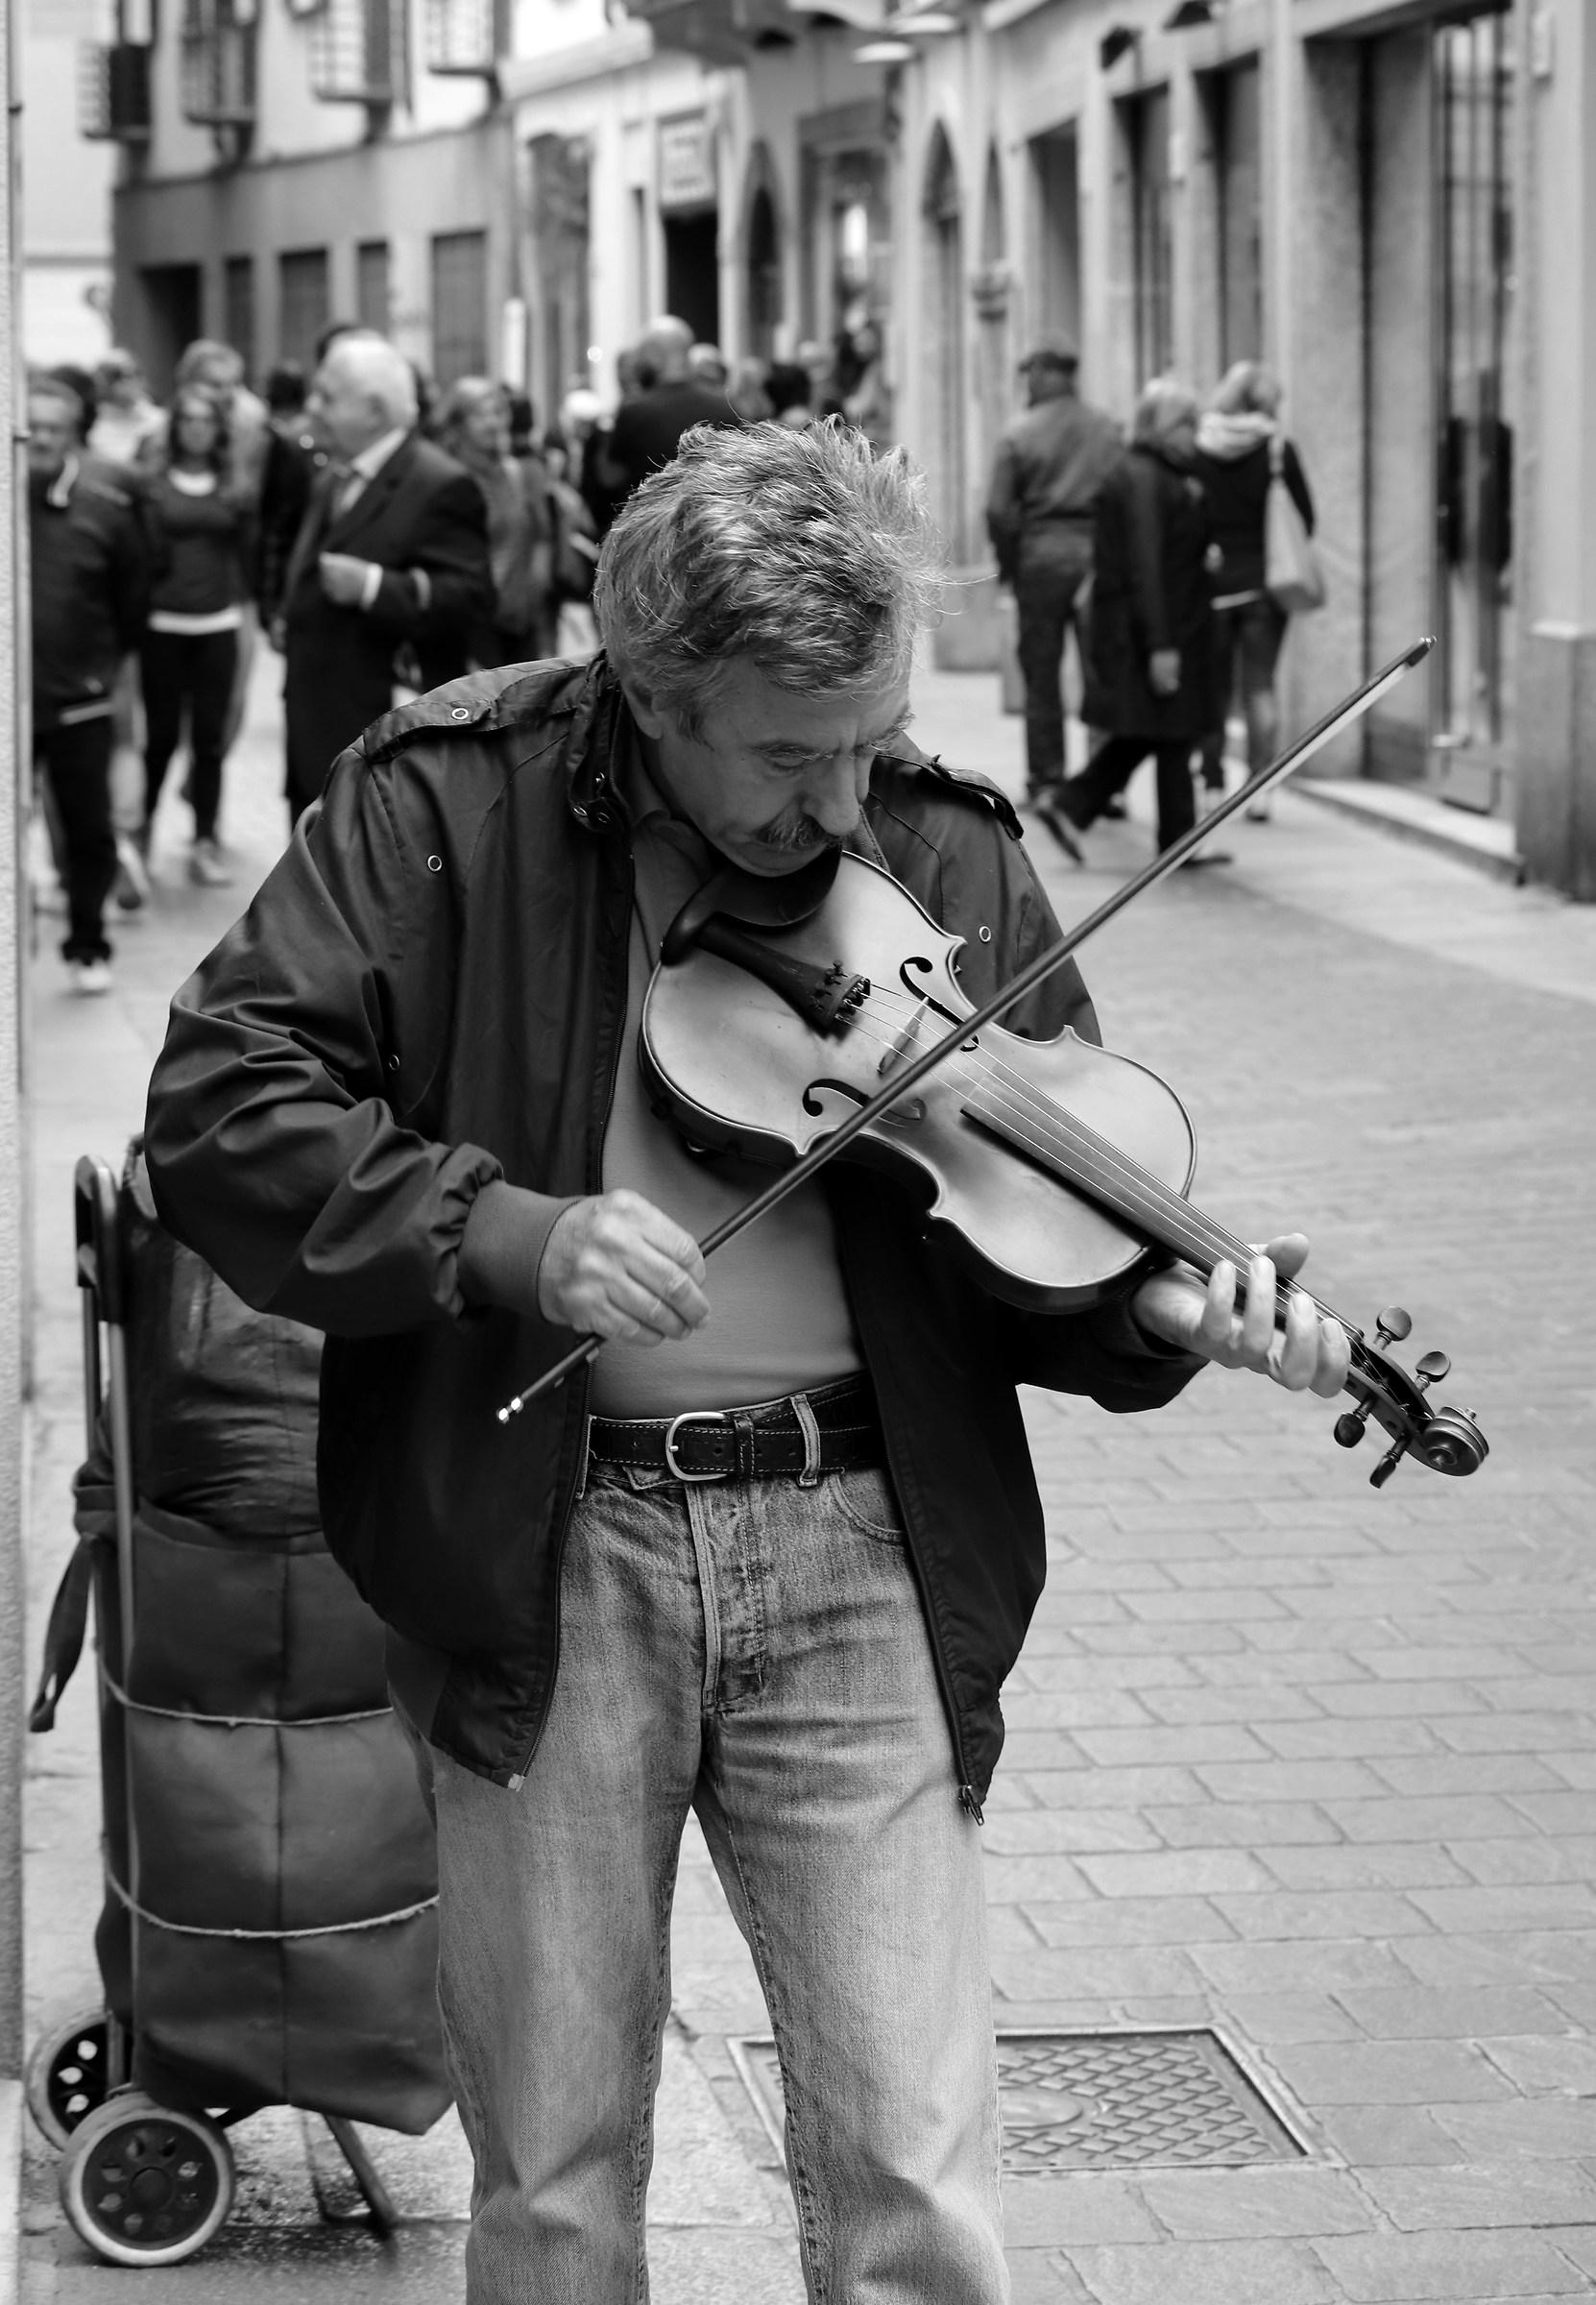 Music on the street...